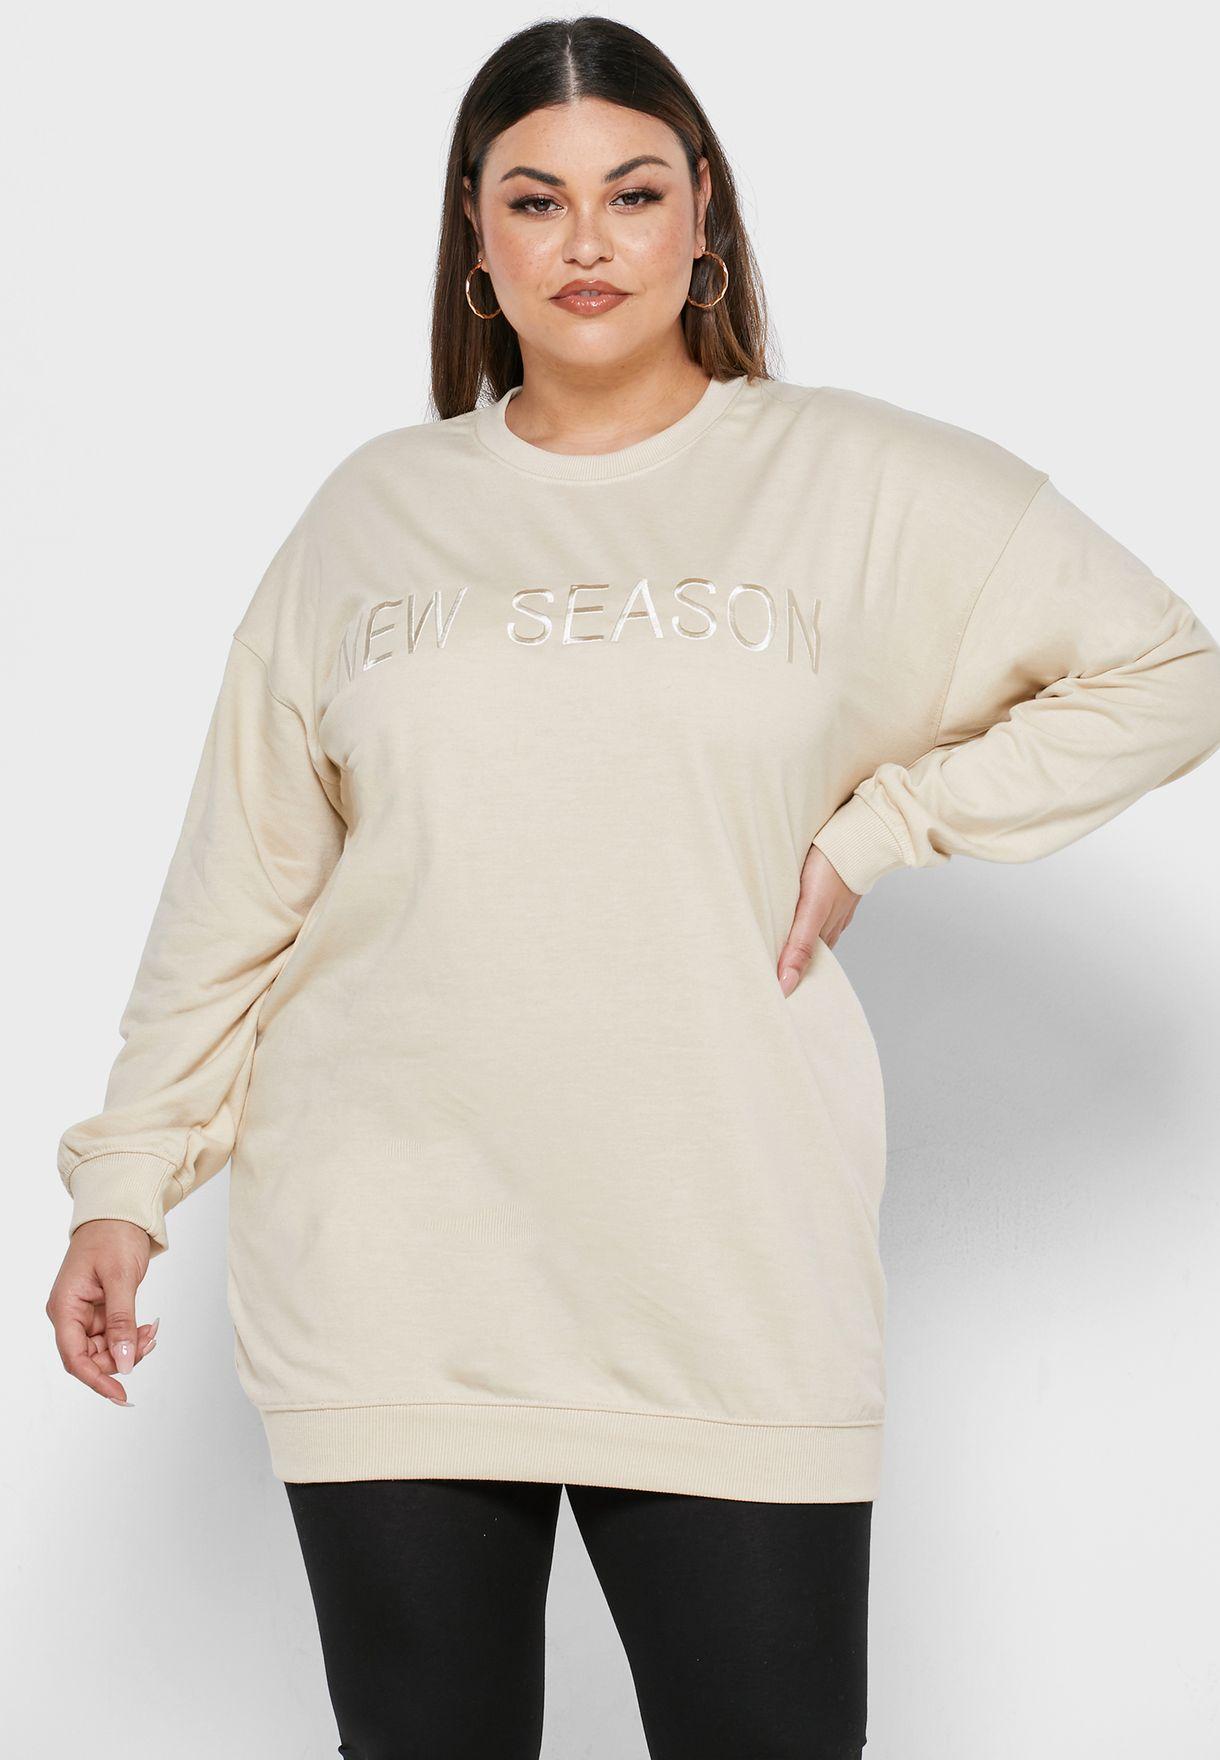 Slogan Sweater Dress